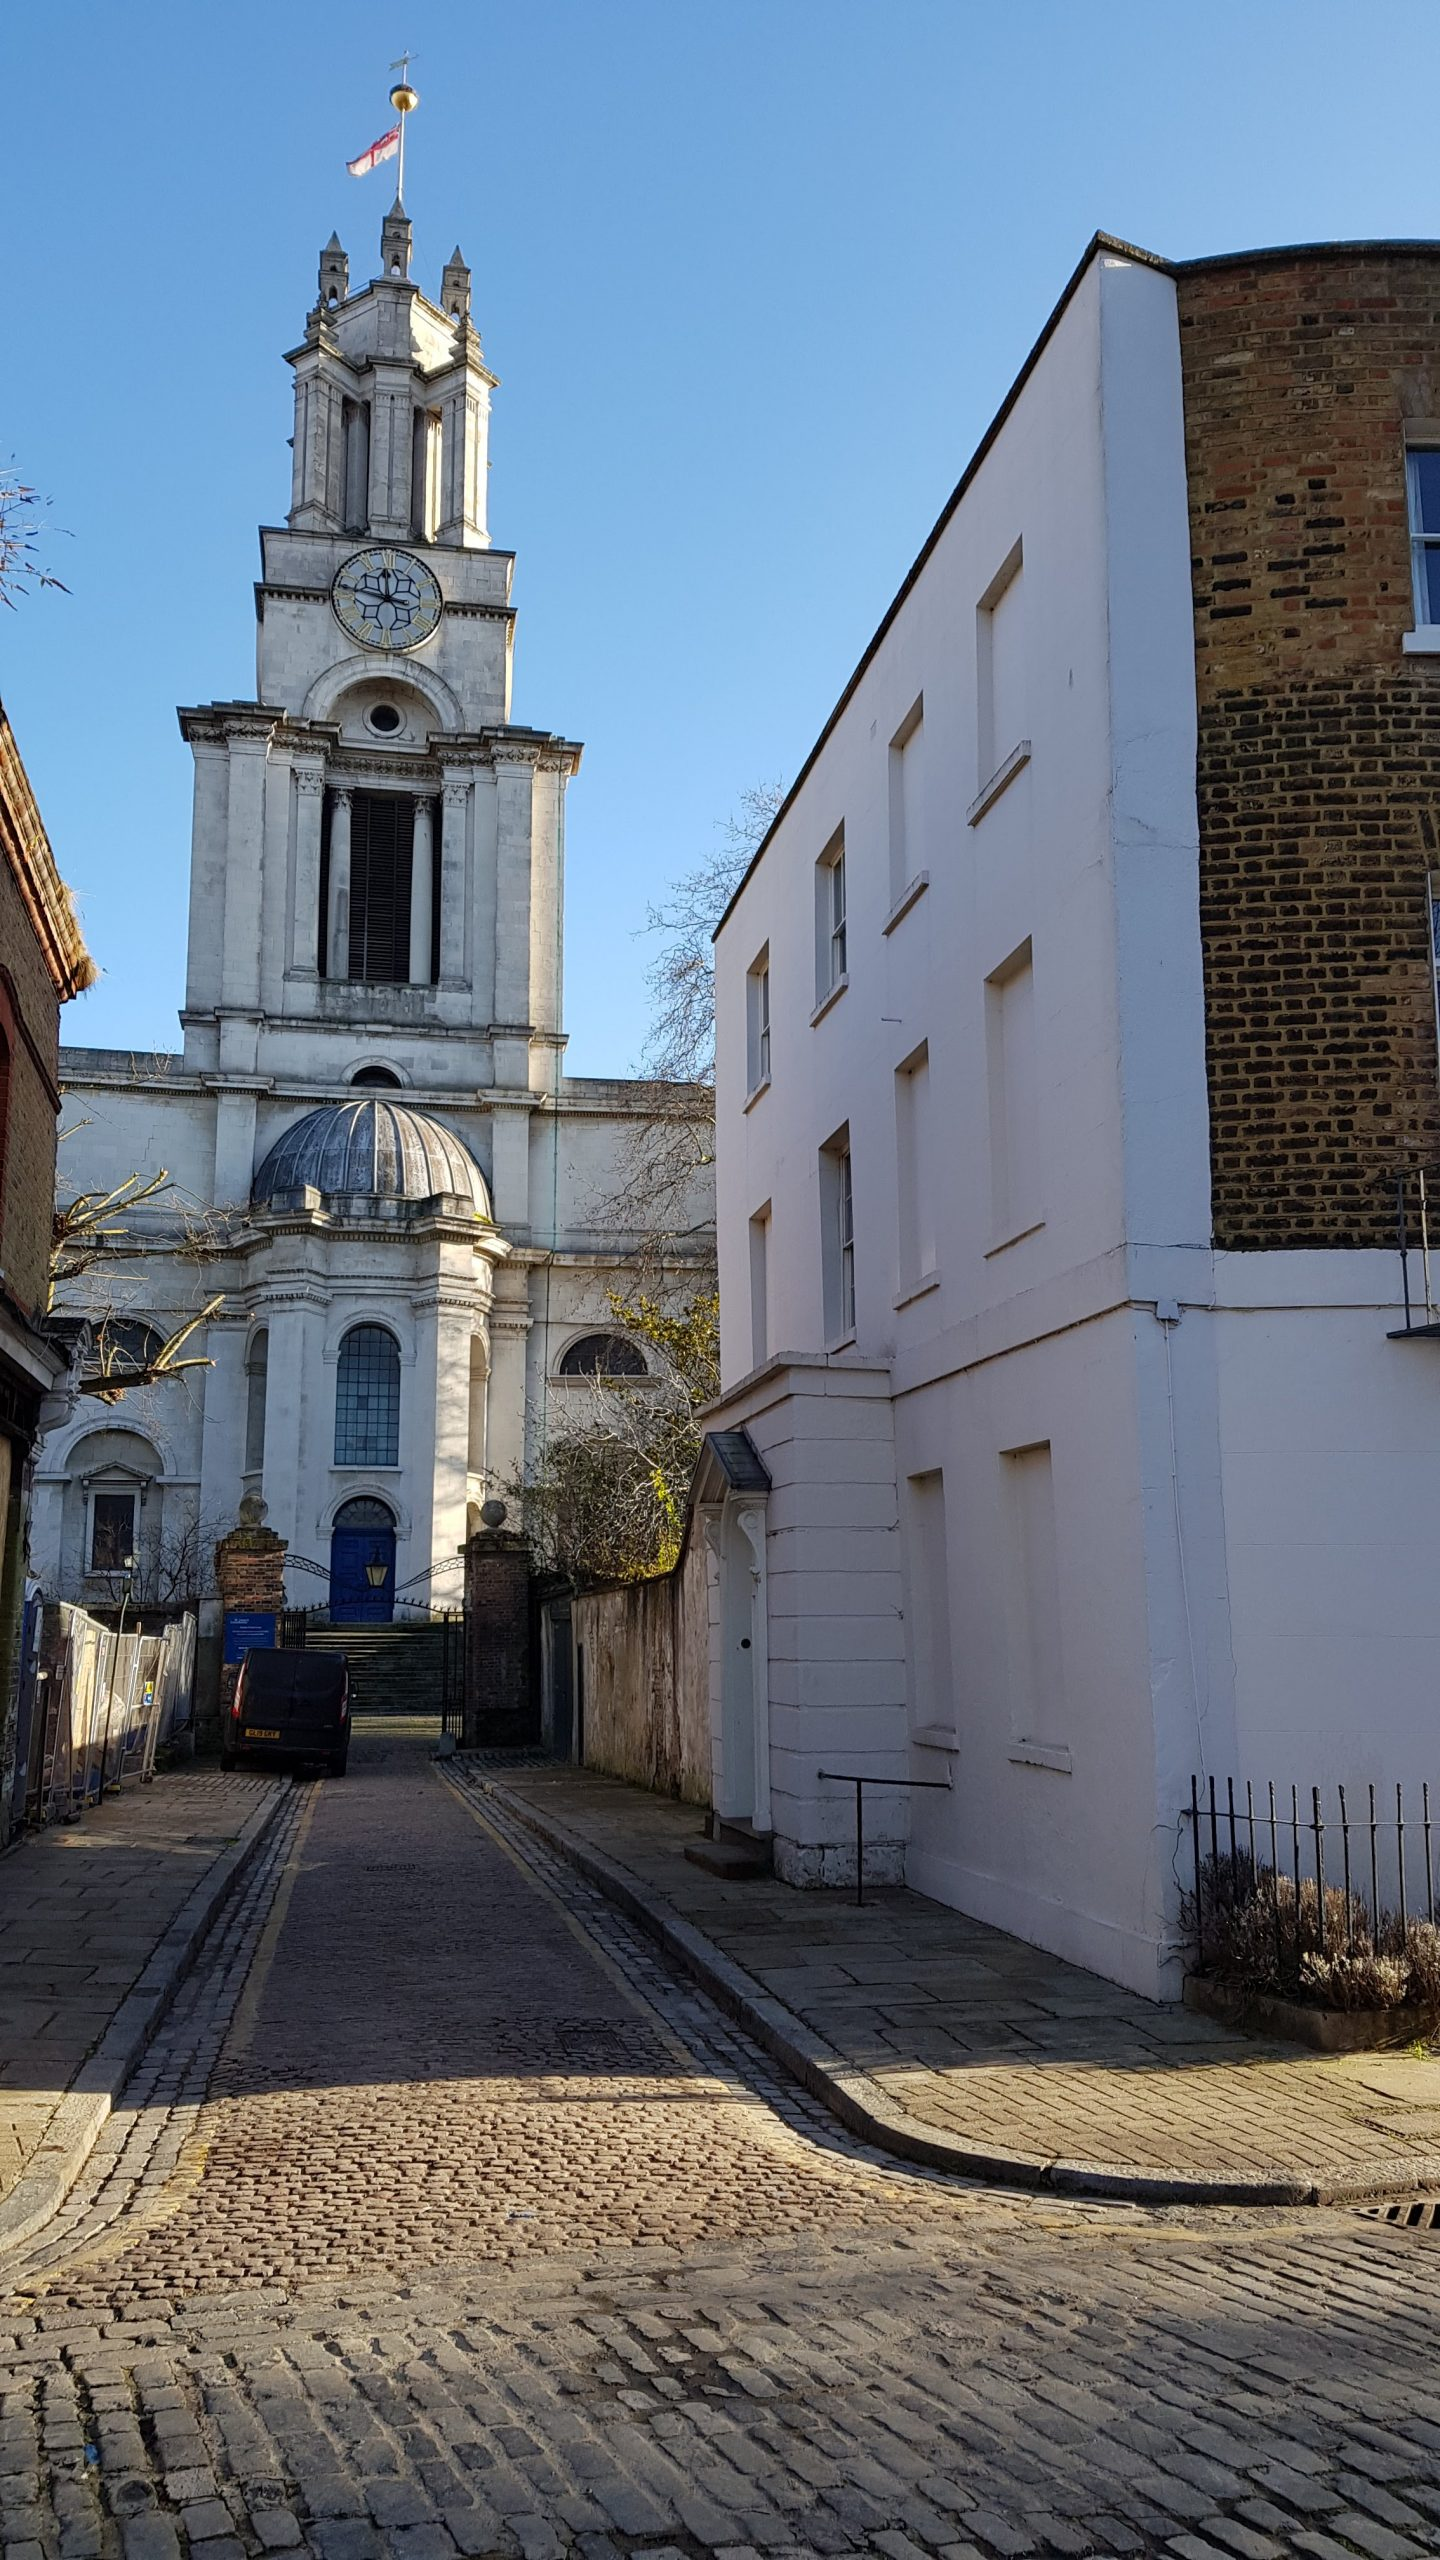 St Anne's Limehouse